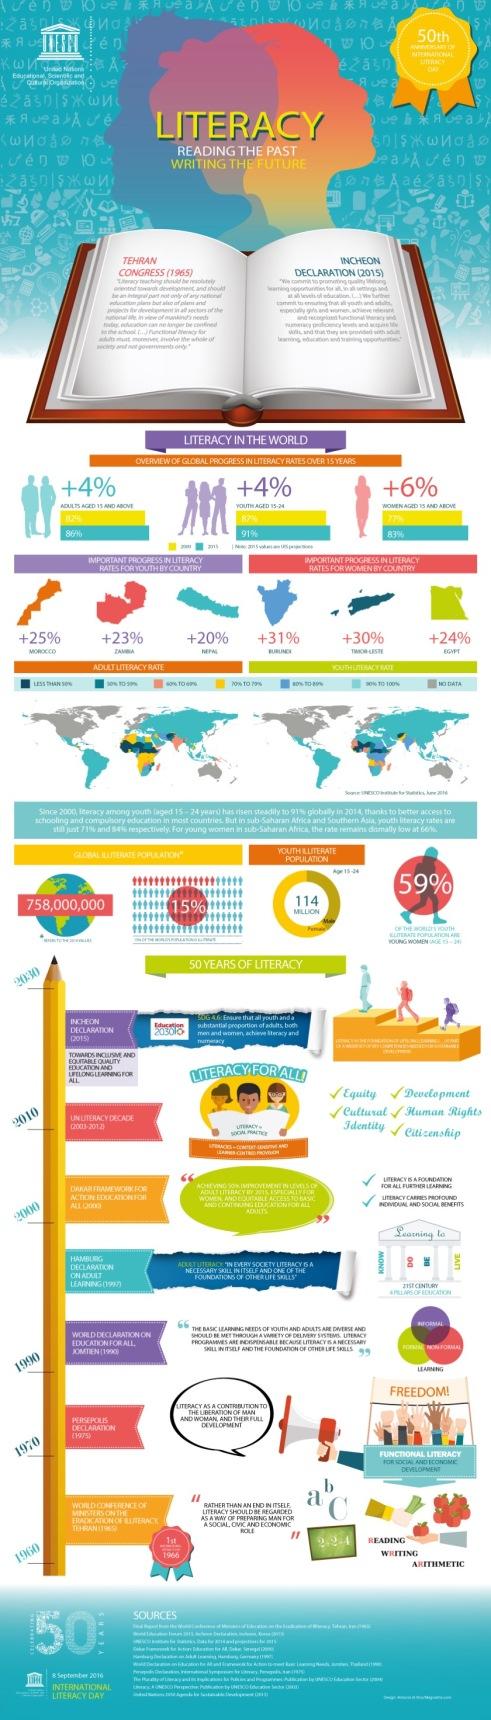 50-years-of-international-literacy-day-full-infographic